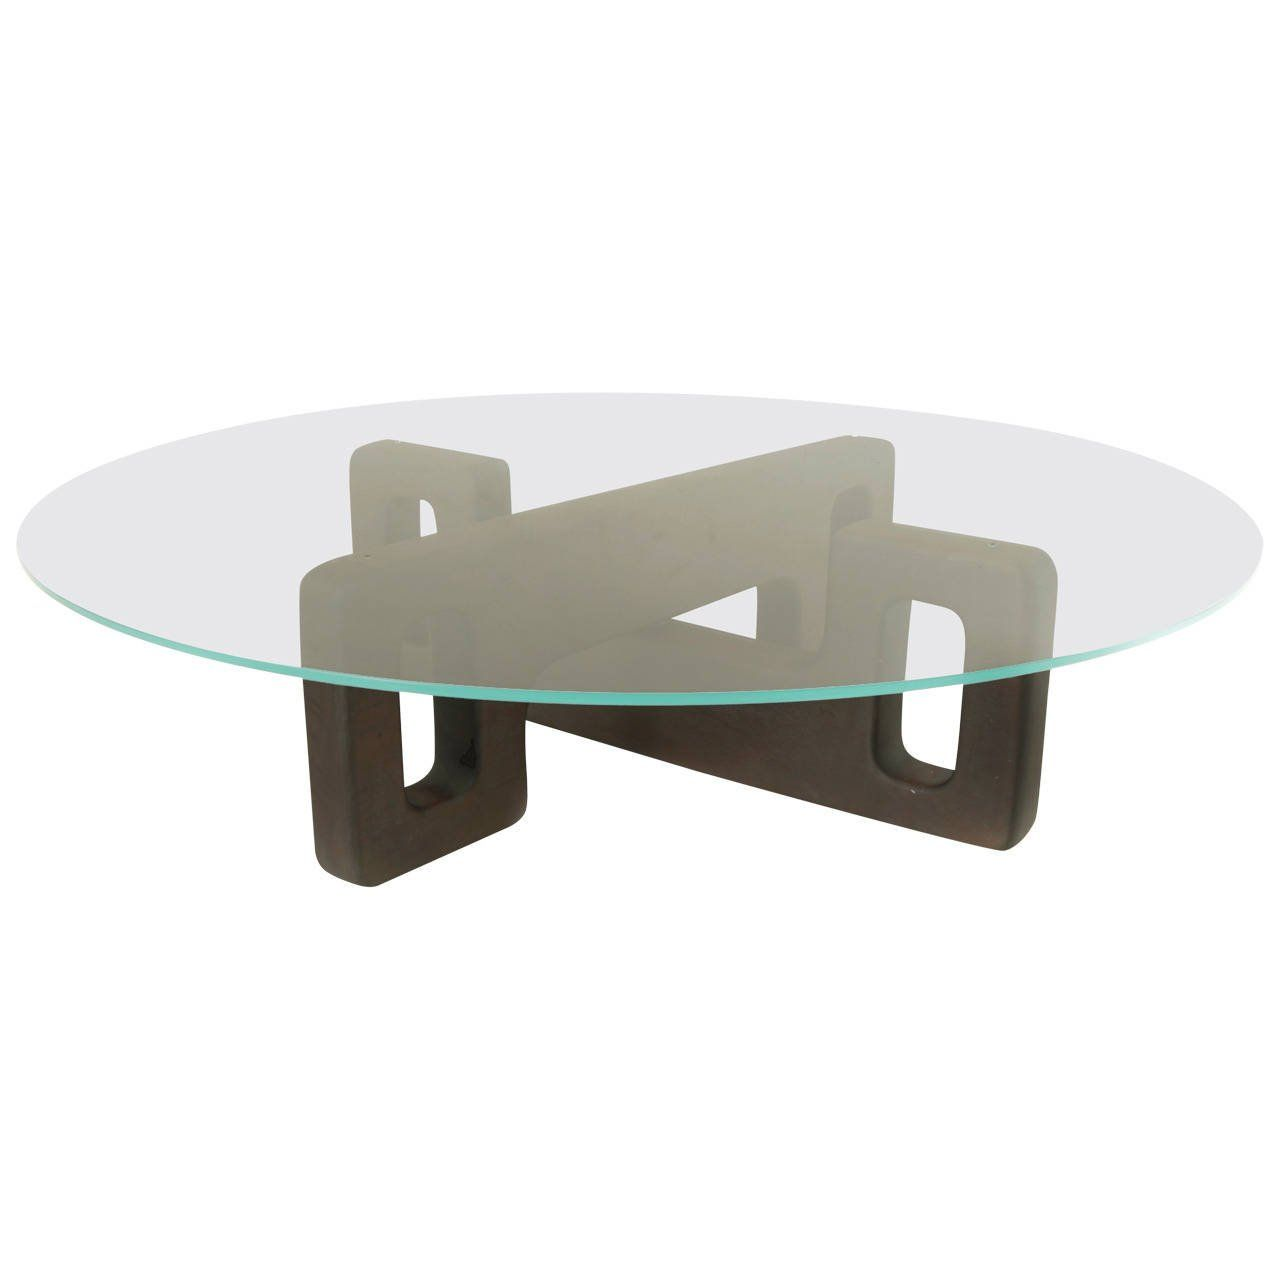 Sculptural Brazilian Cejera Wood And Glass Coffee Table Coffee Table Glass Coffee Table Glass [ 1280 x 1280 Pixel ]